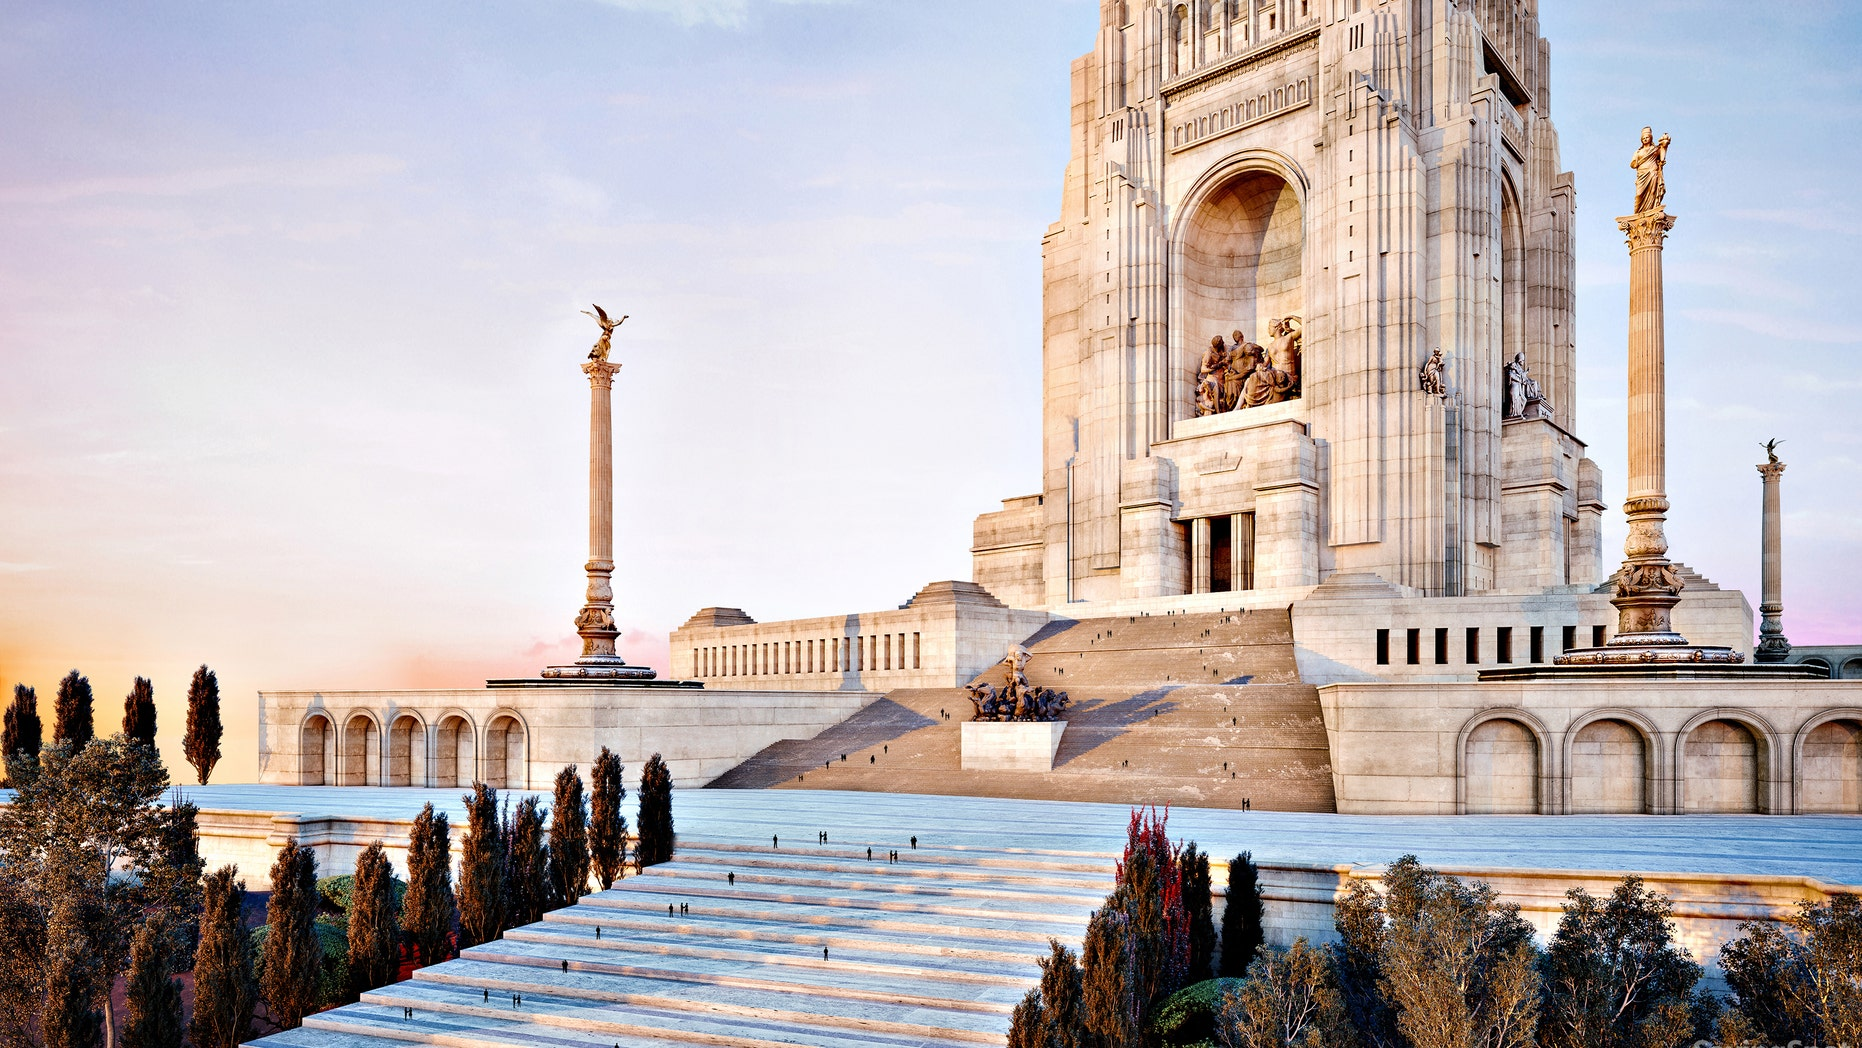 A digital rendering of the unbuilt Mother's Memorial in Washington, D.C.